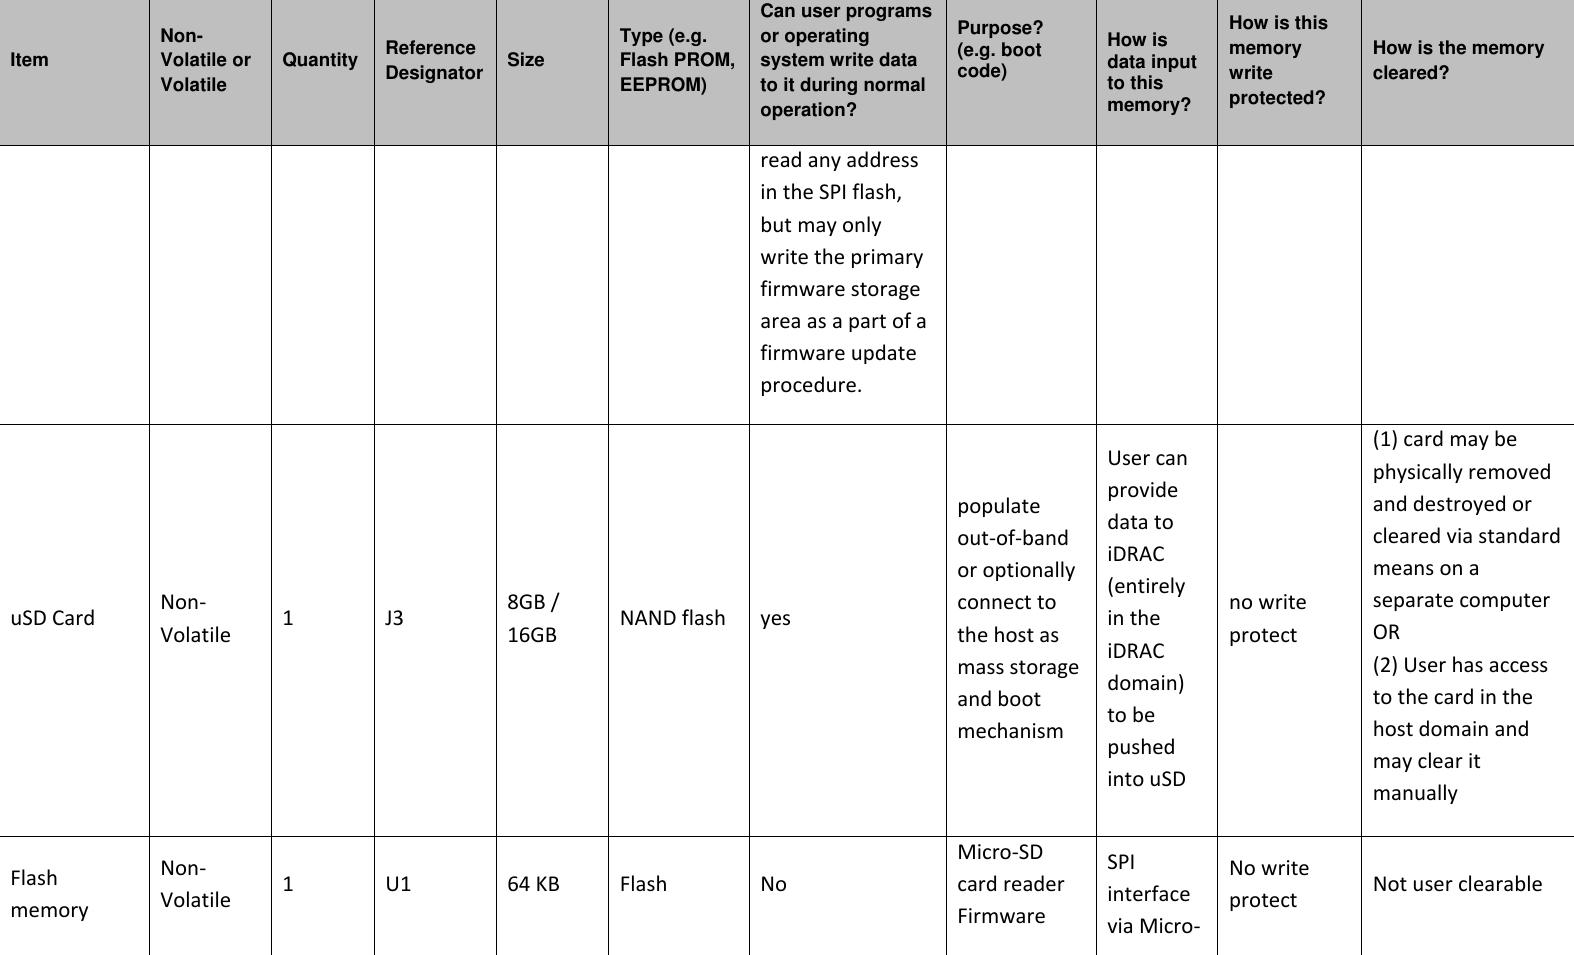 Dell Poweredge c6400 EMC And C6420 Statement Of Volatility